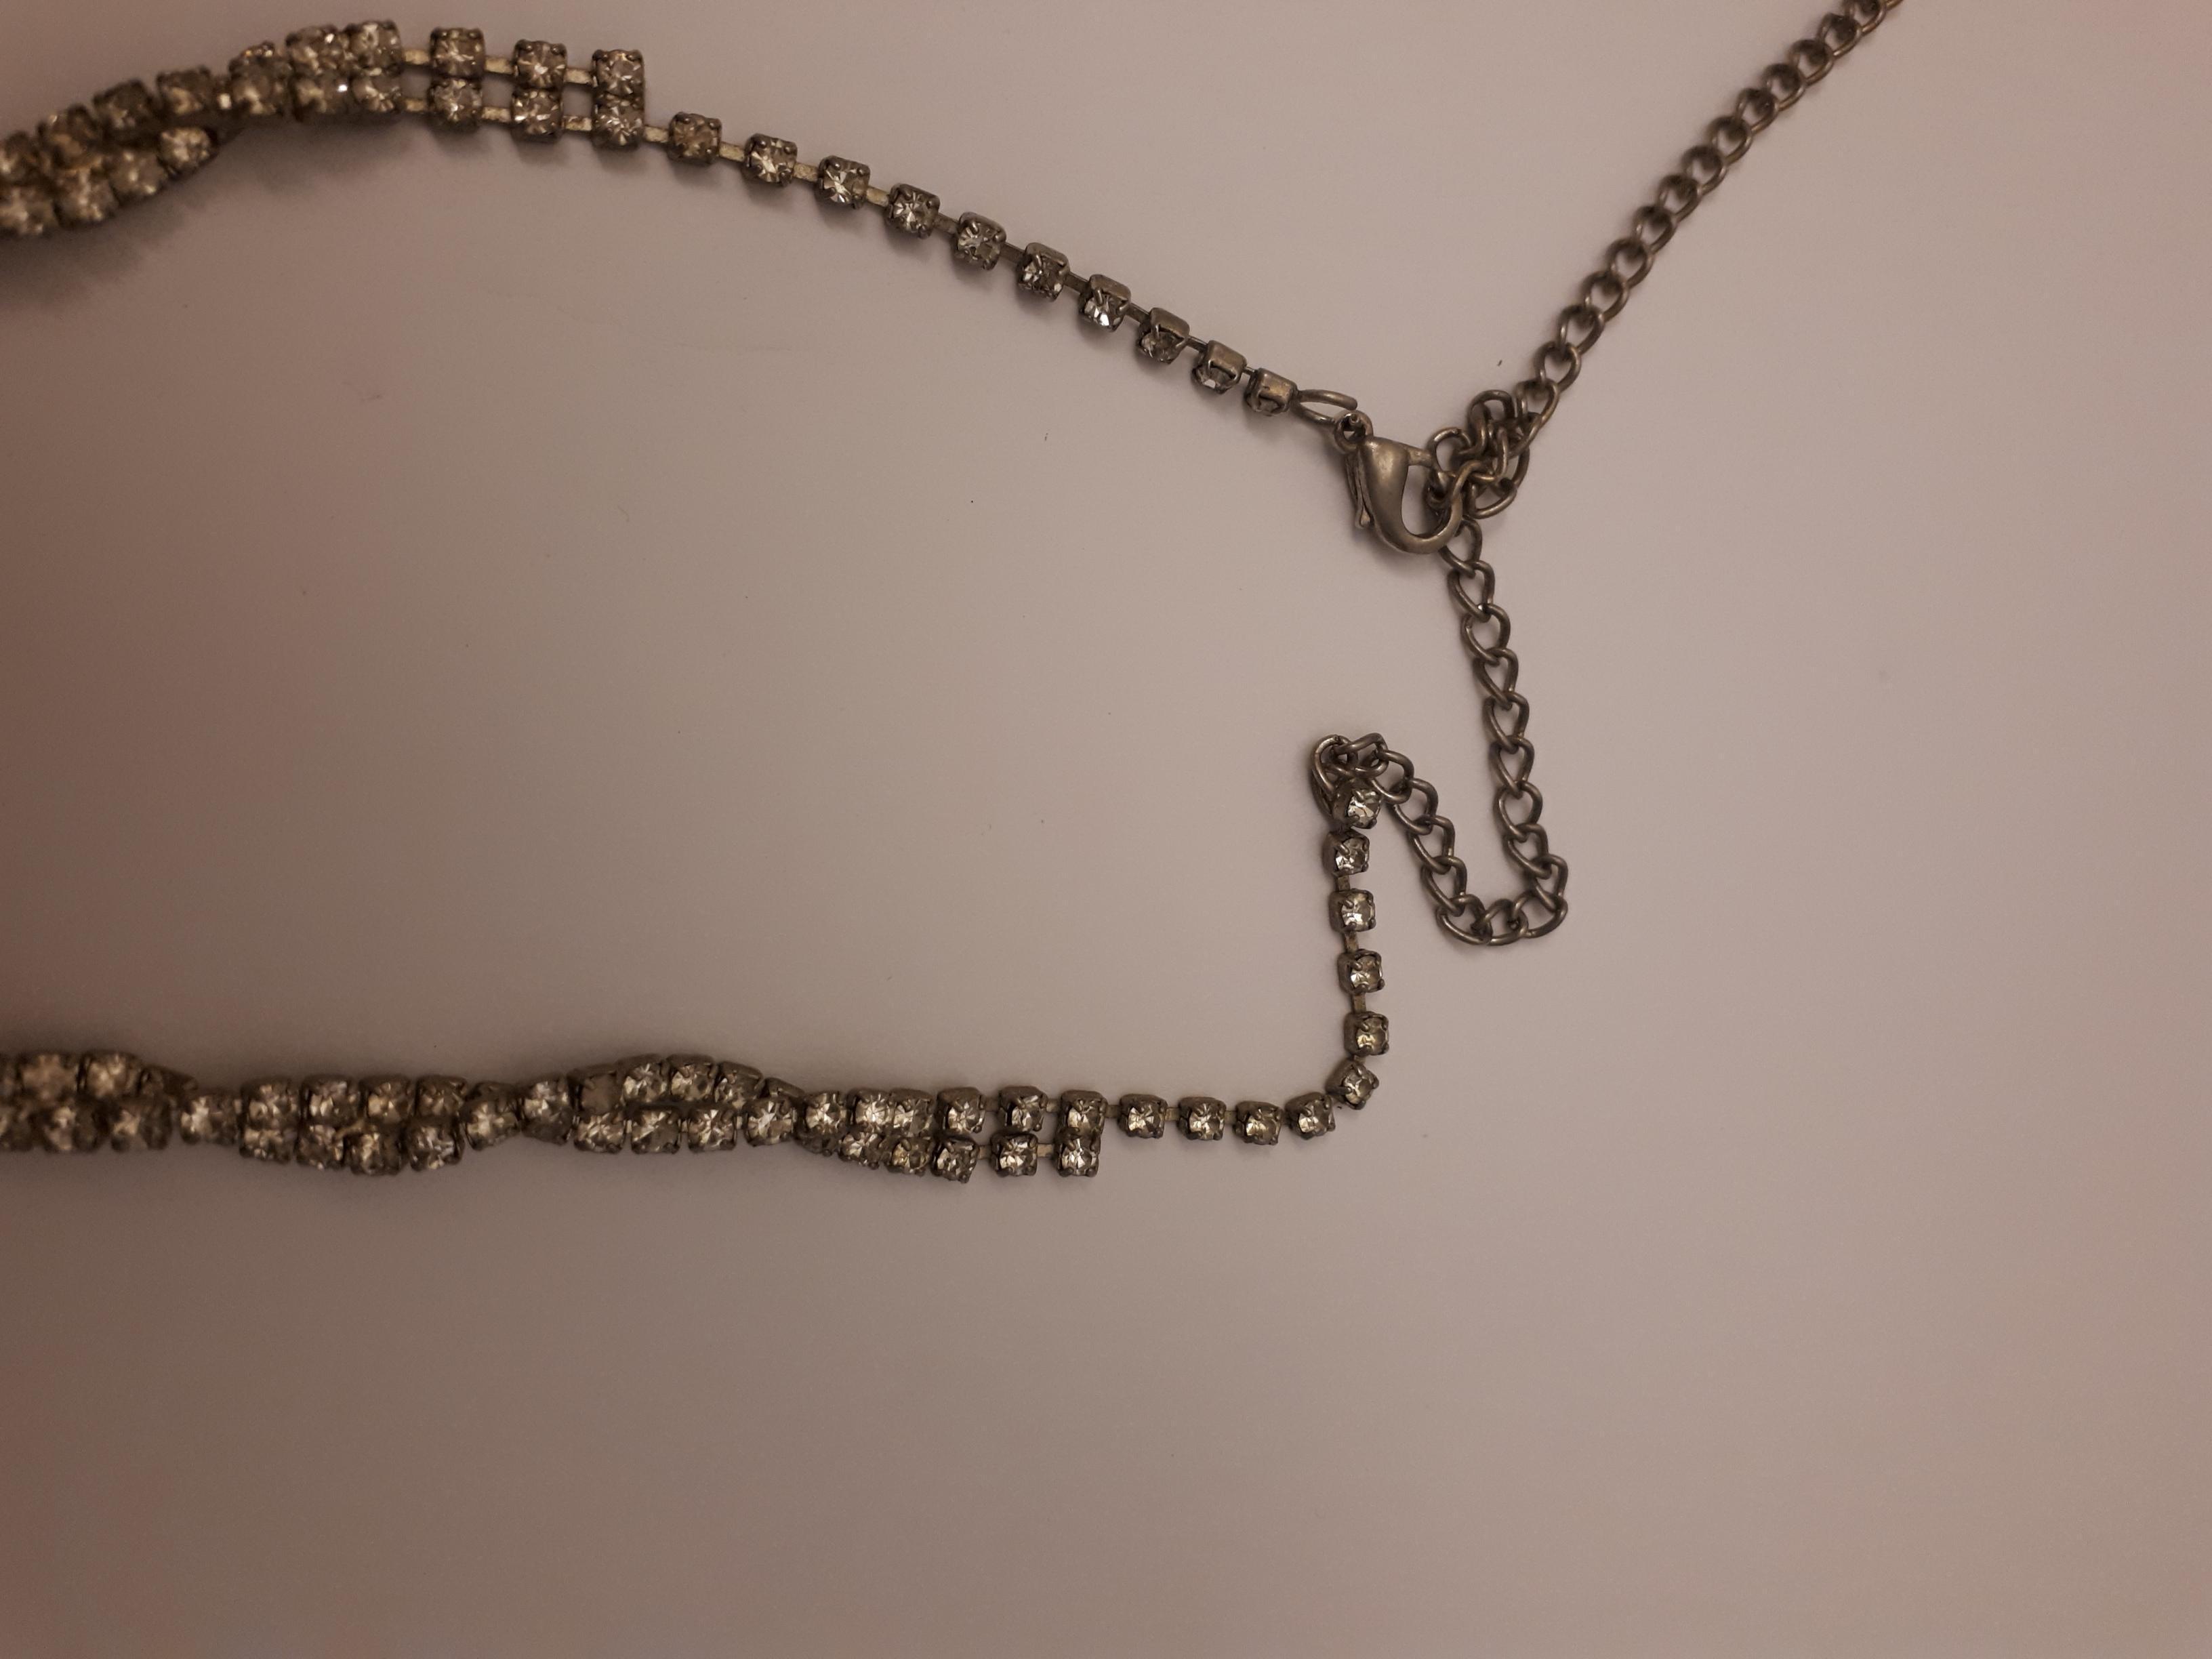 troc de troc collier strass image 2